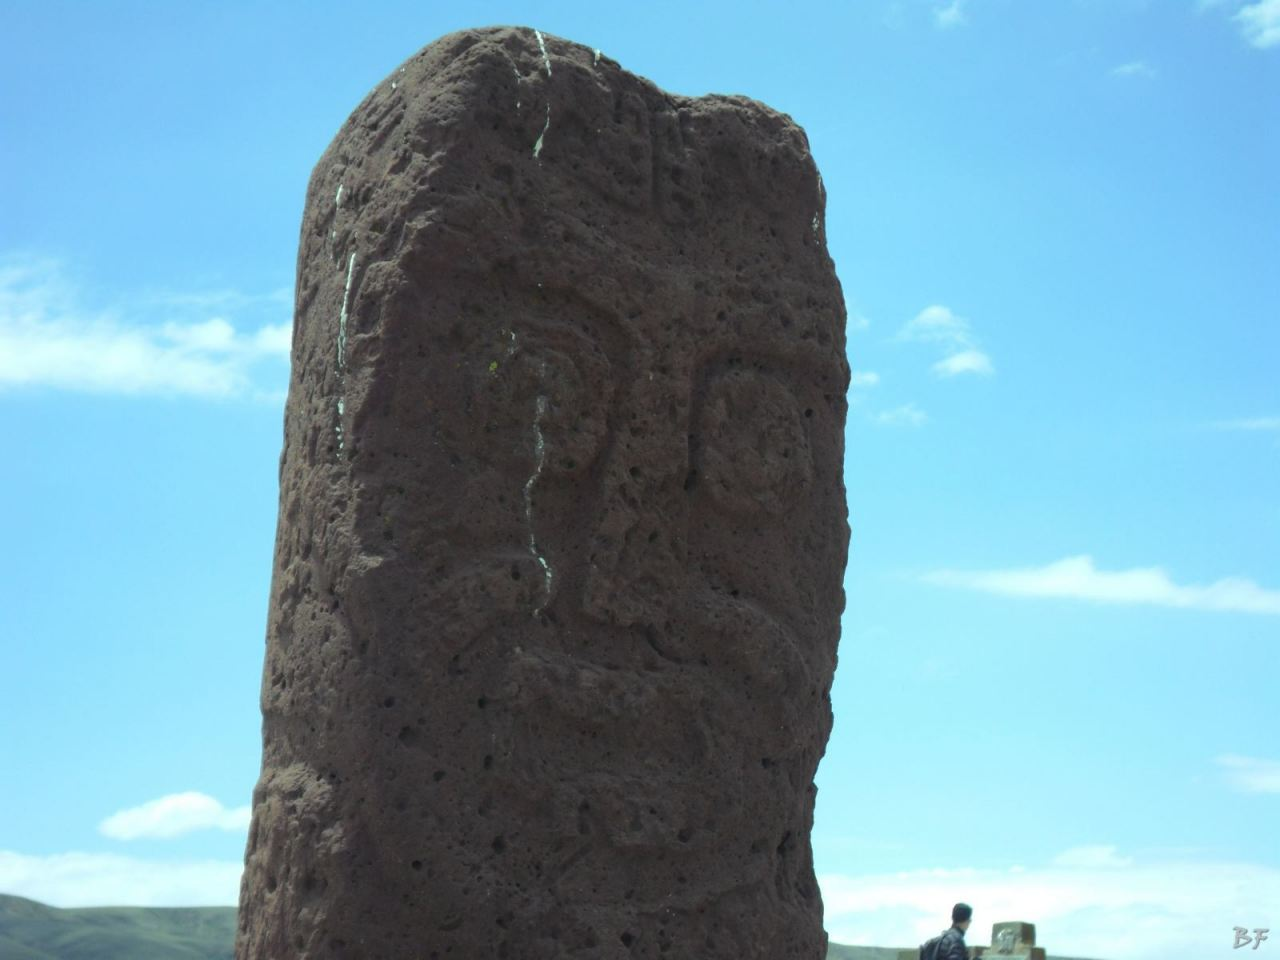 Sito-Megalitico-Piramide-Akapana-Kalasasaya-Menhir-Tiahuanaco-Bolivia-88